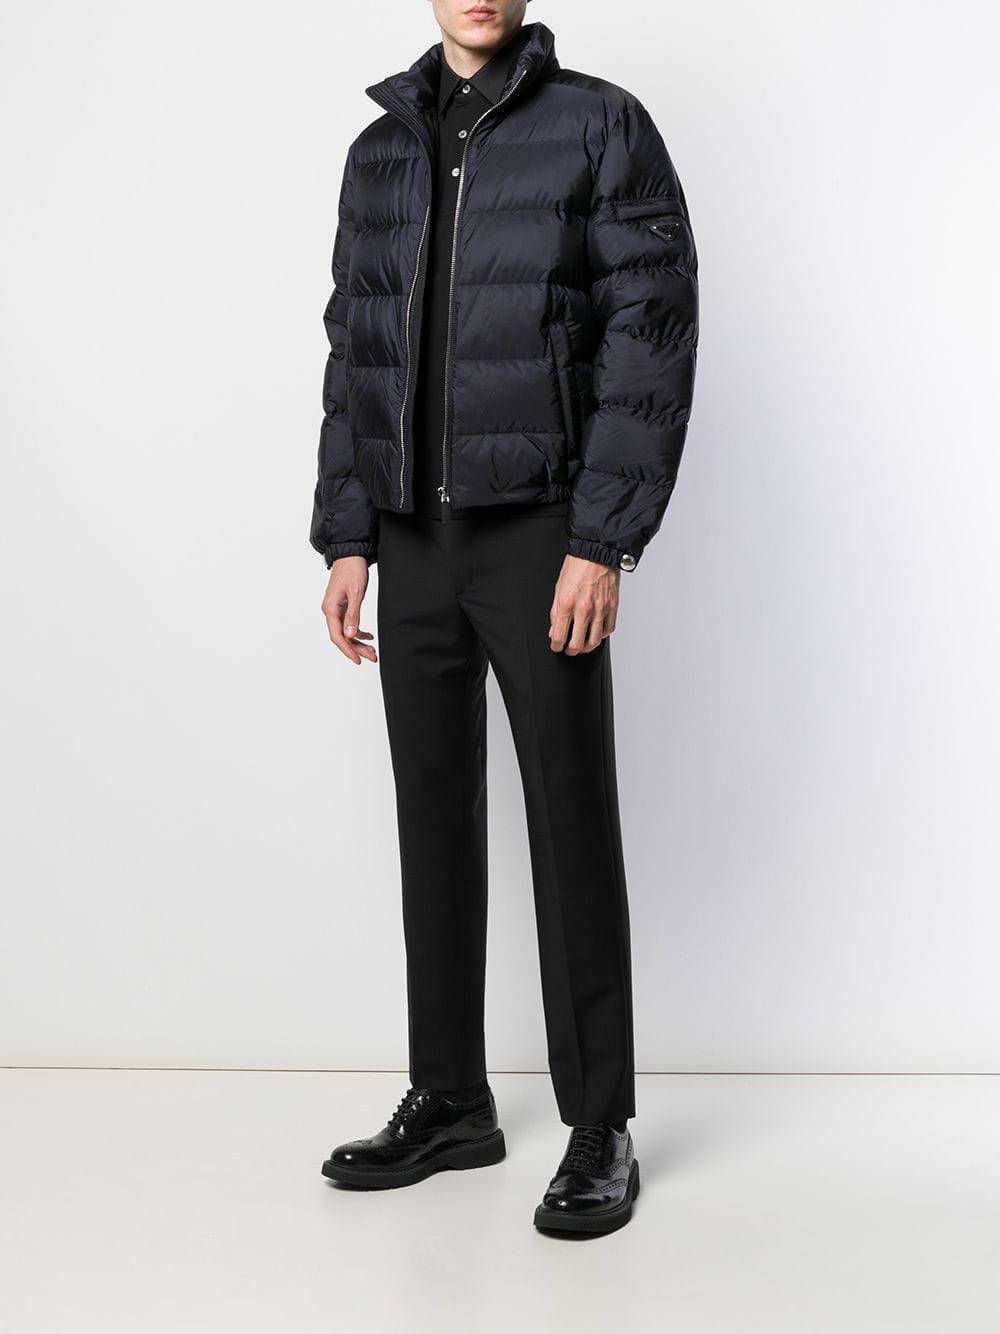 7dd0675d1 Prada Zipper Feather Down Puffer Jacket in Blue for Men - Lyst